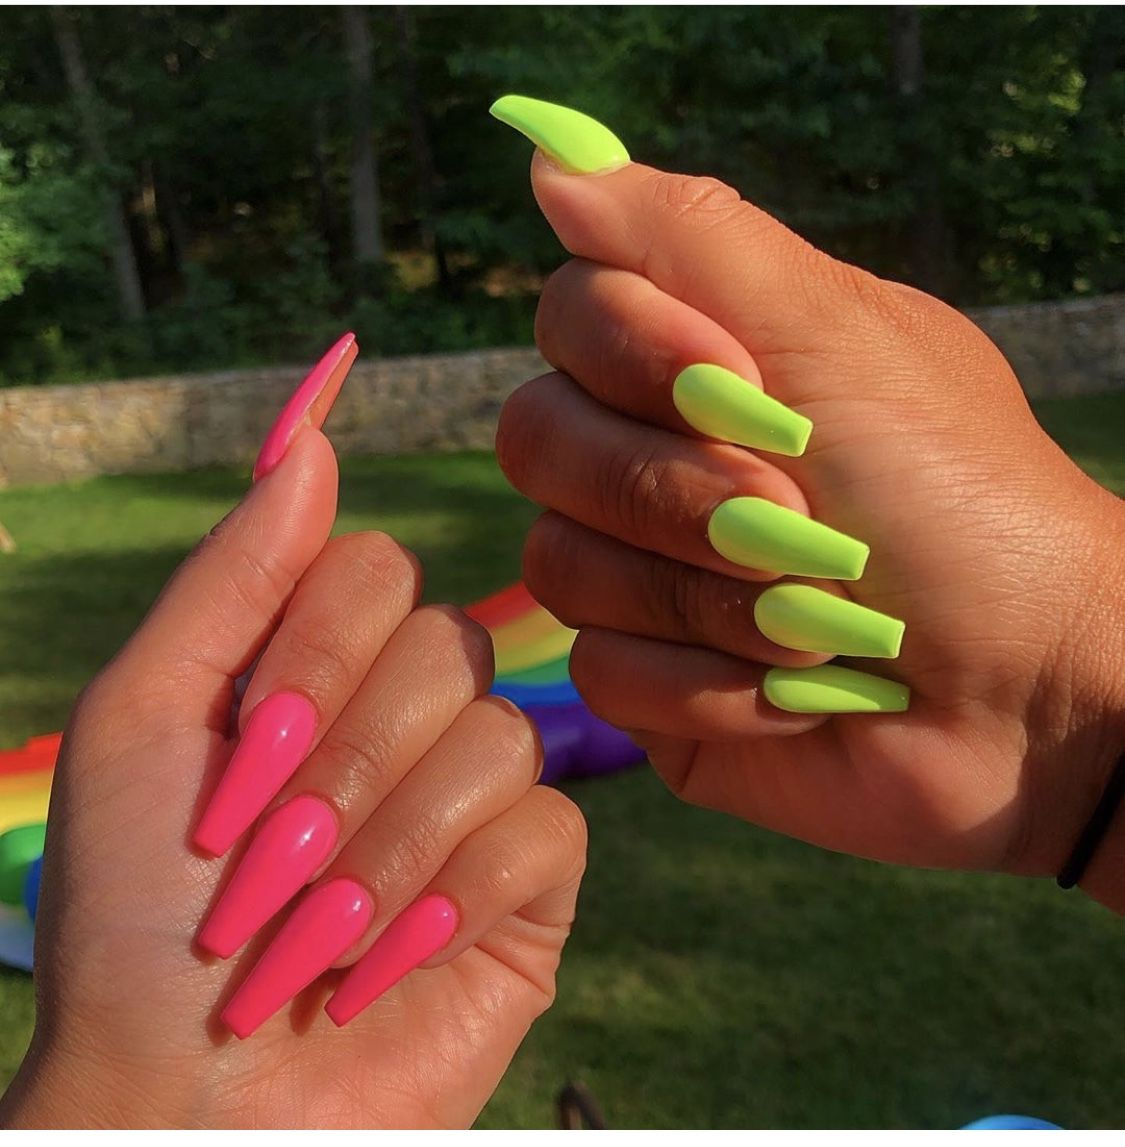 Pin By Cervena Svicka On Nails B Yasssss Green Acrylic Nails Aycrlic Nails Pink Acrylic Nails